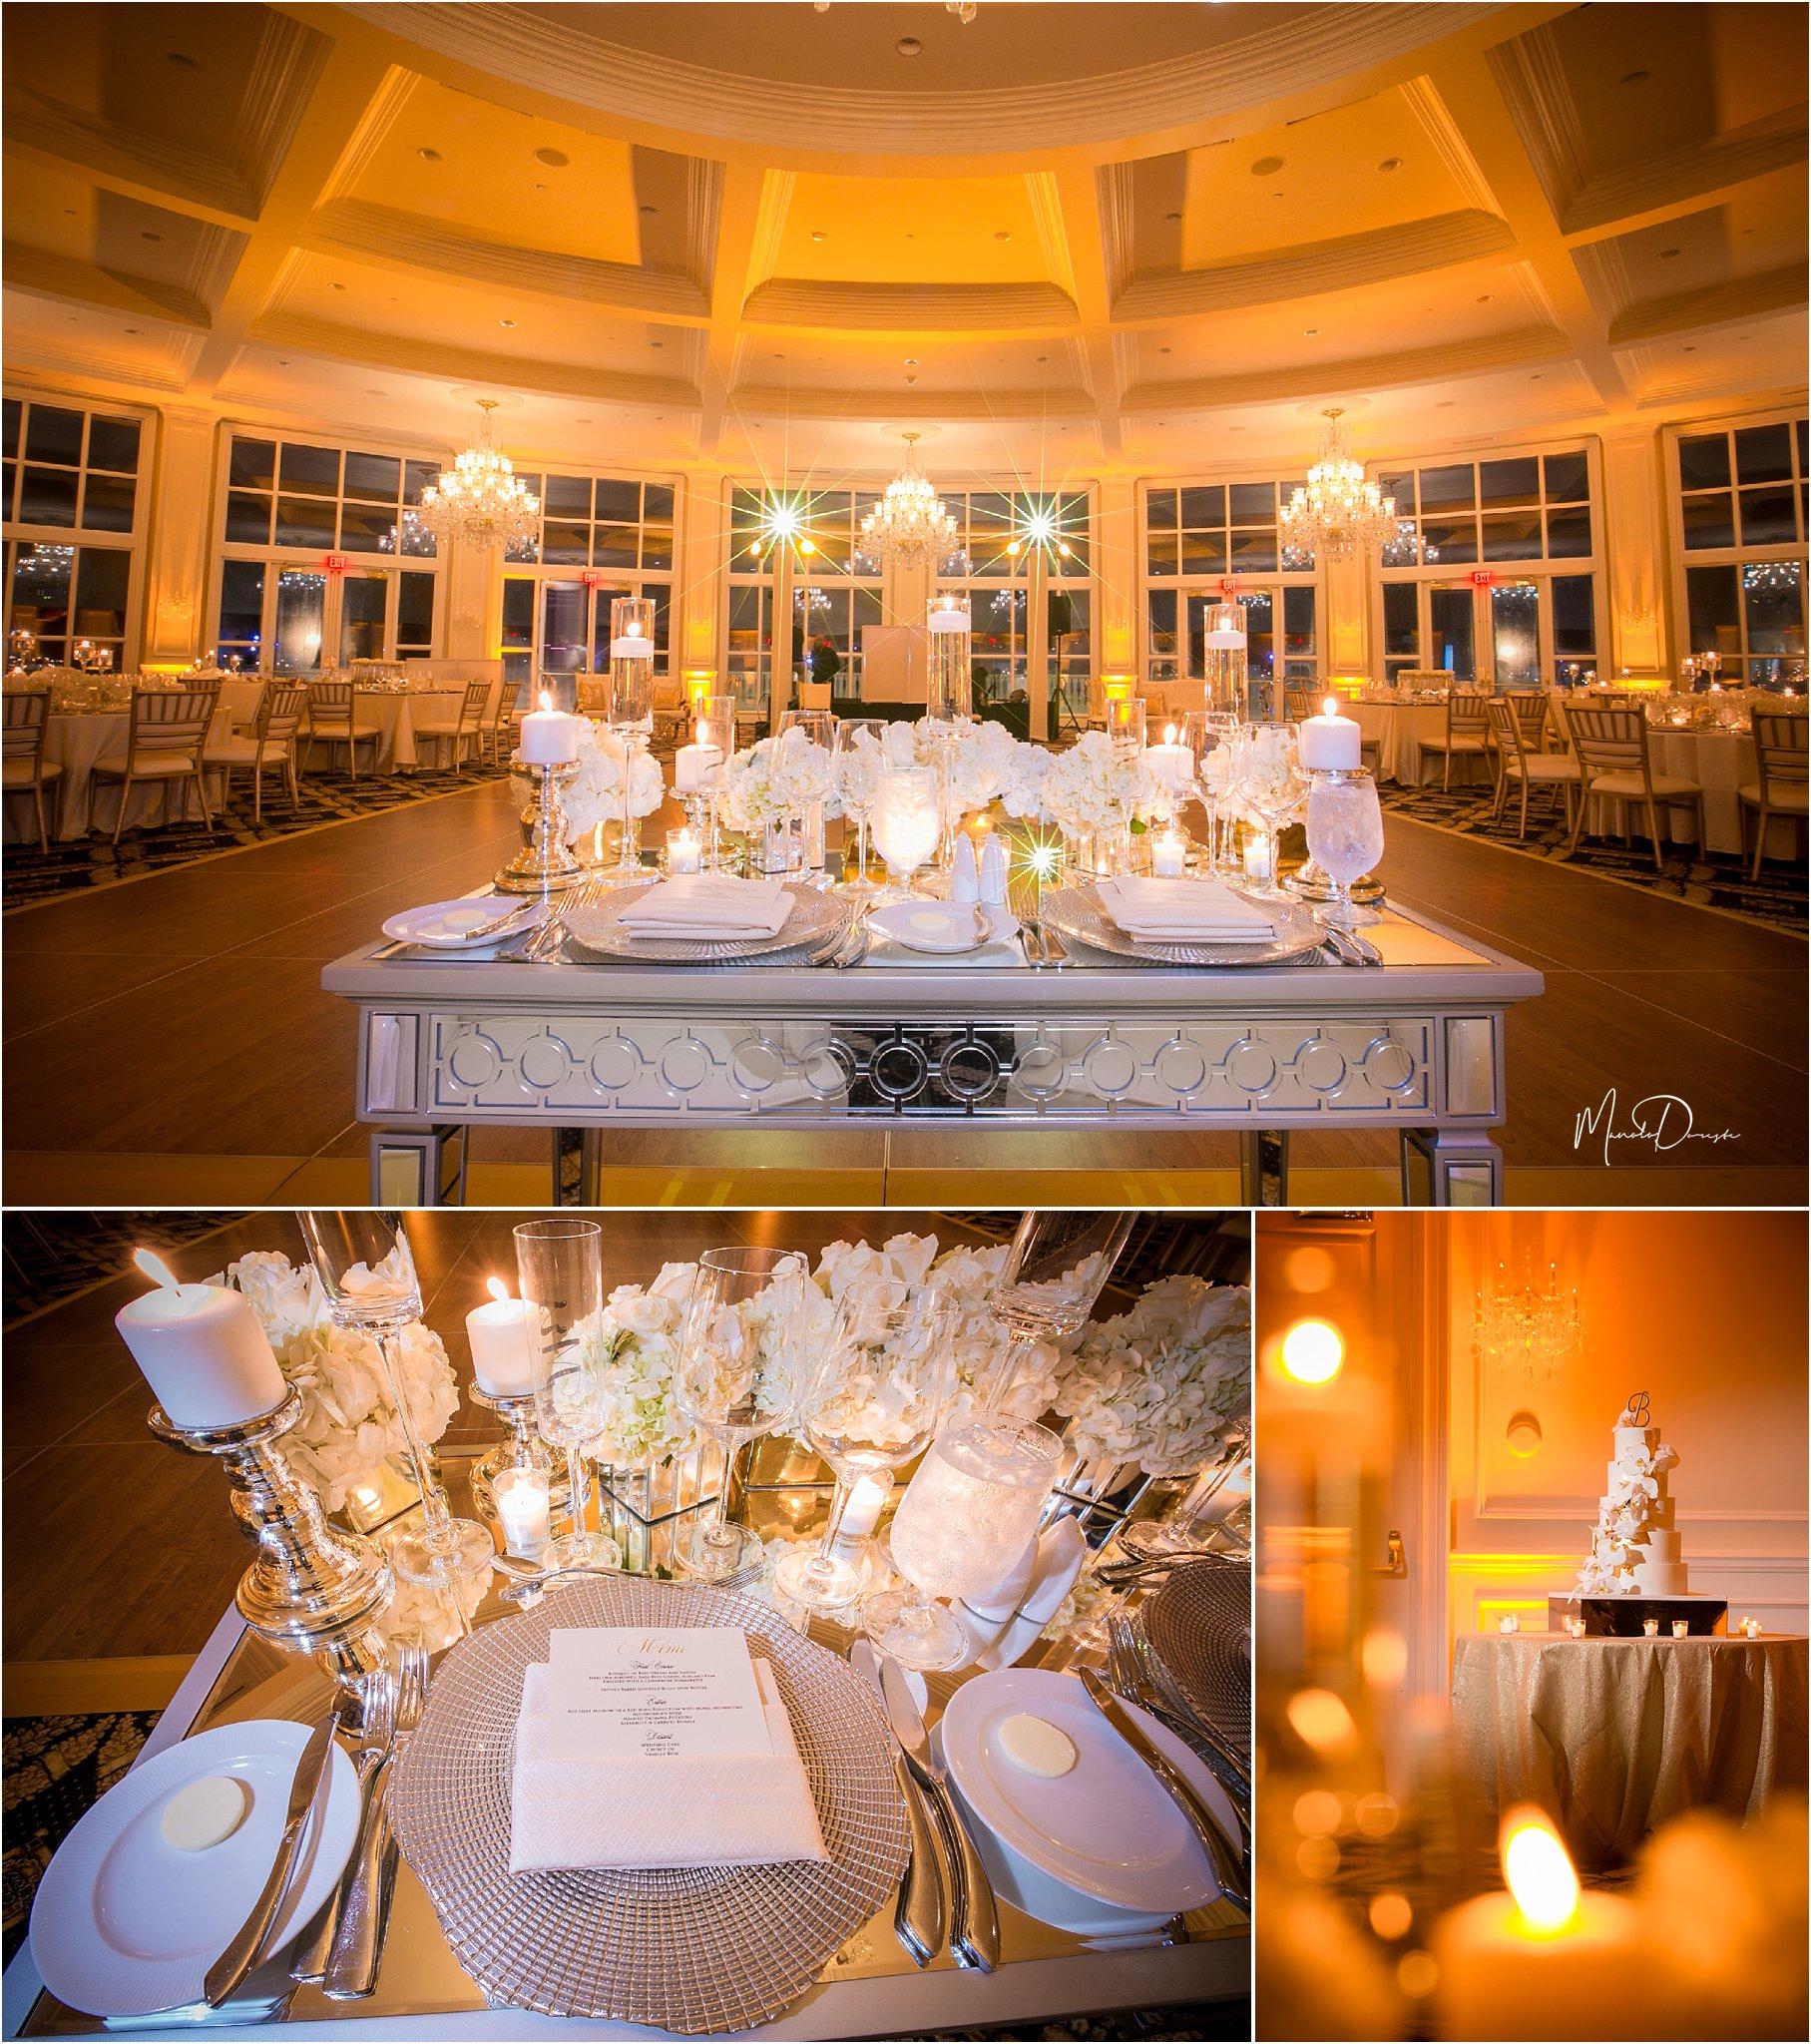 00967_ManoloDoreste_InFocusStudios_Wedding_Family_Photography_Miami_MiamiPhotographer.jpg